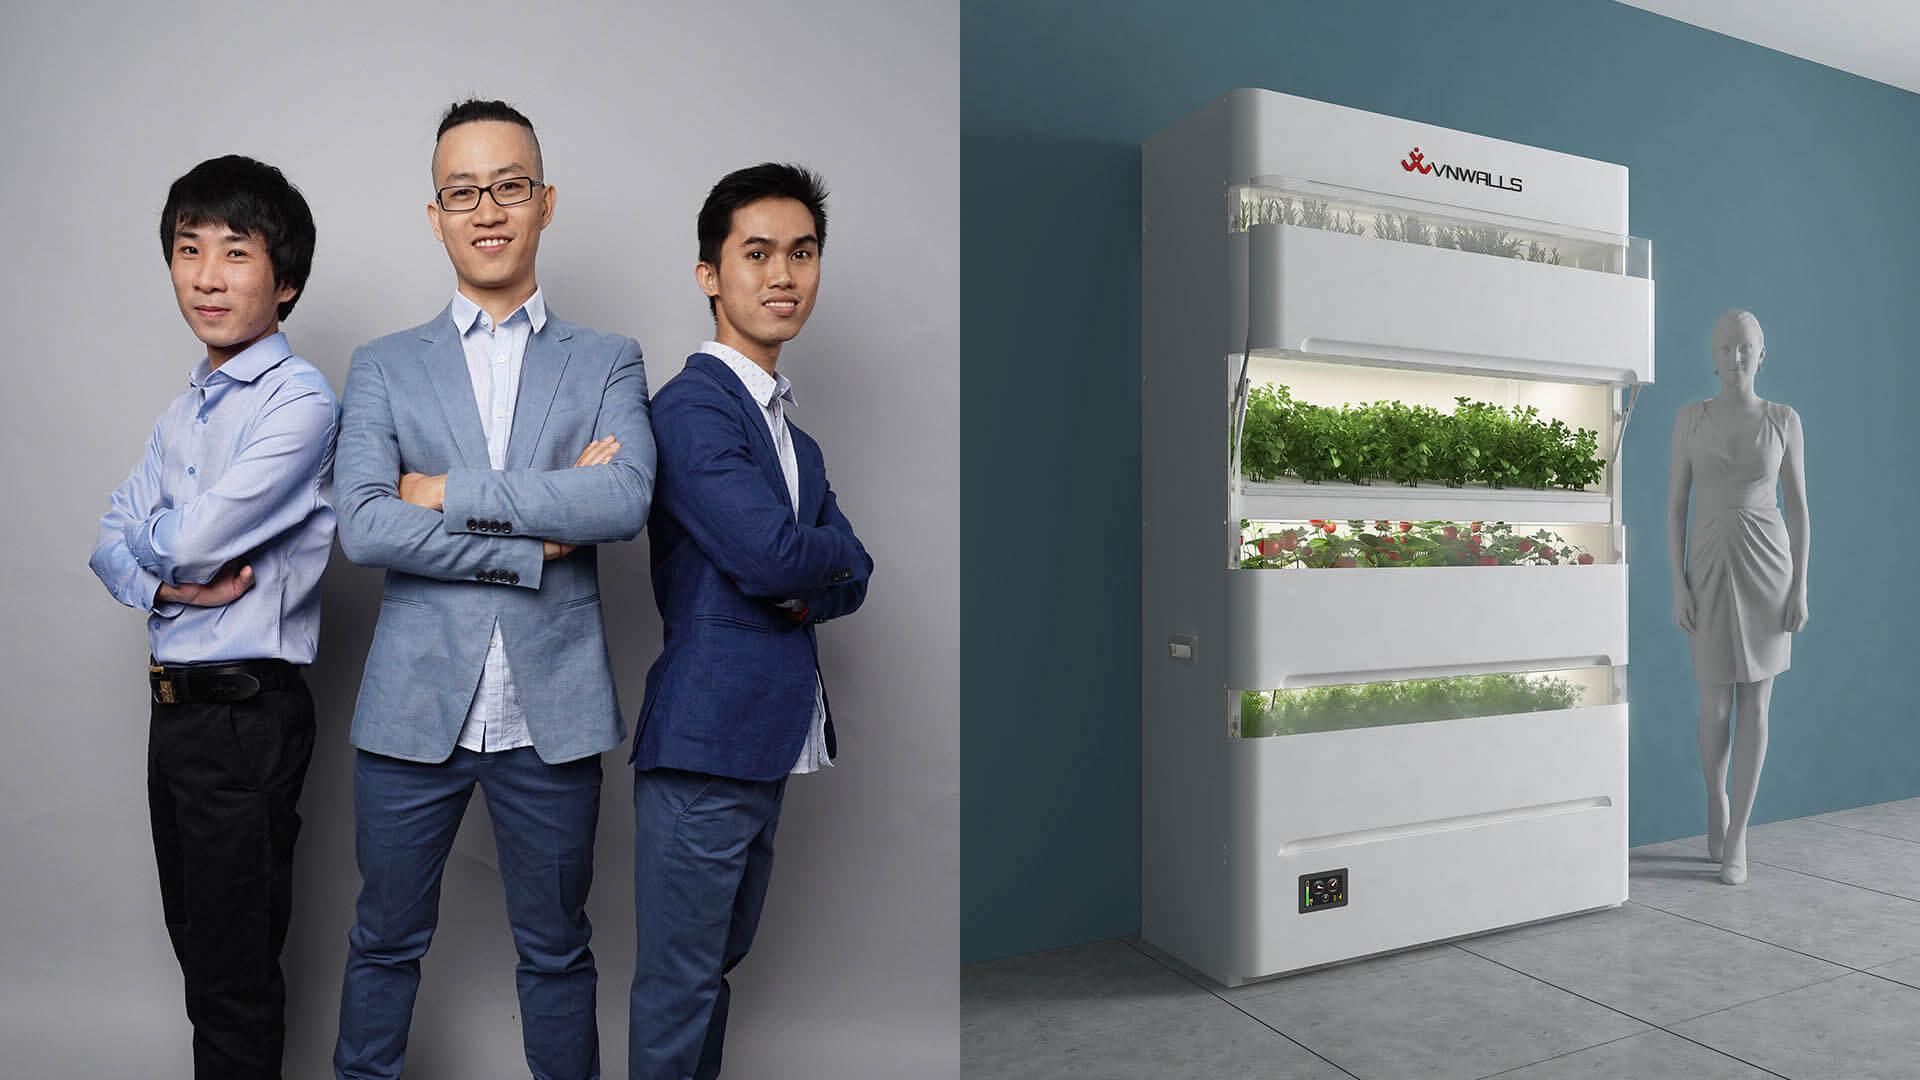 2018 lexus lda panel vnwalls